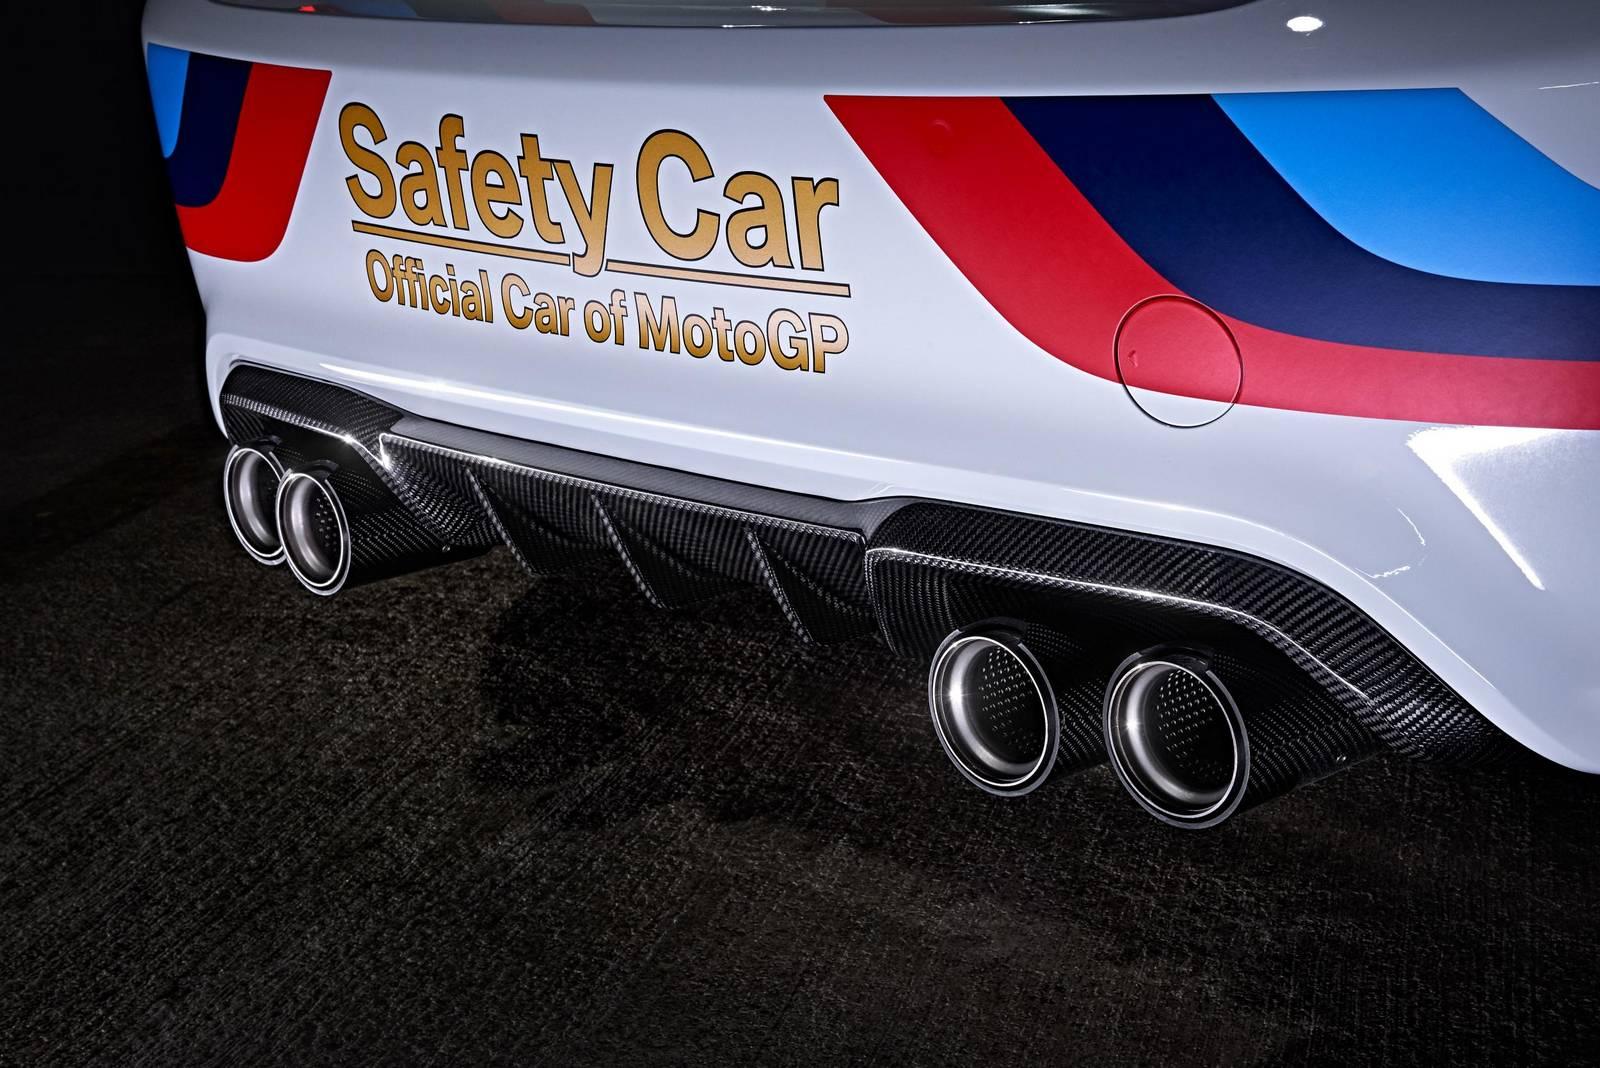 2016 Bmw M2 Moto Gp Safety Car